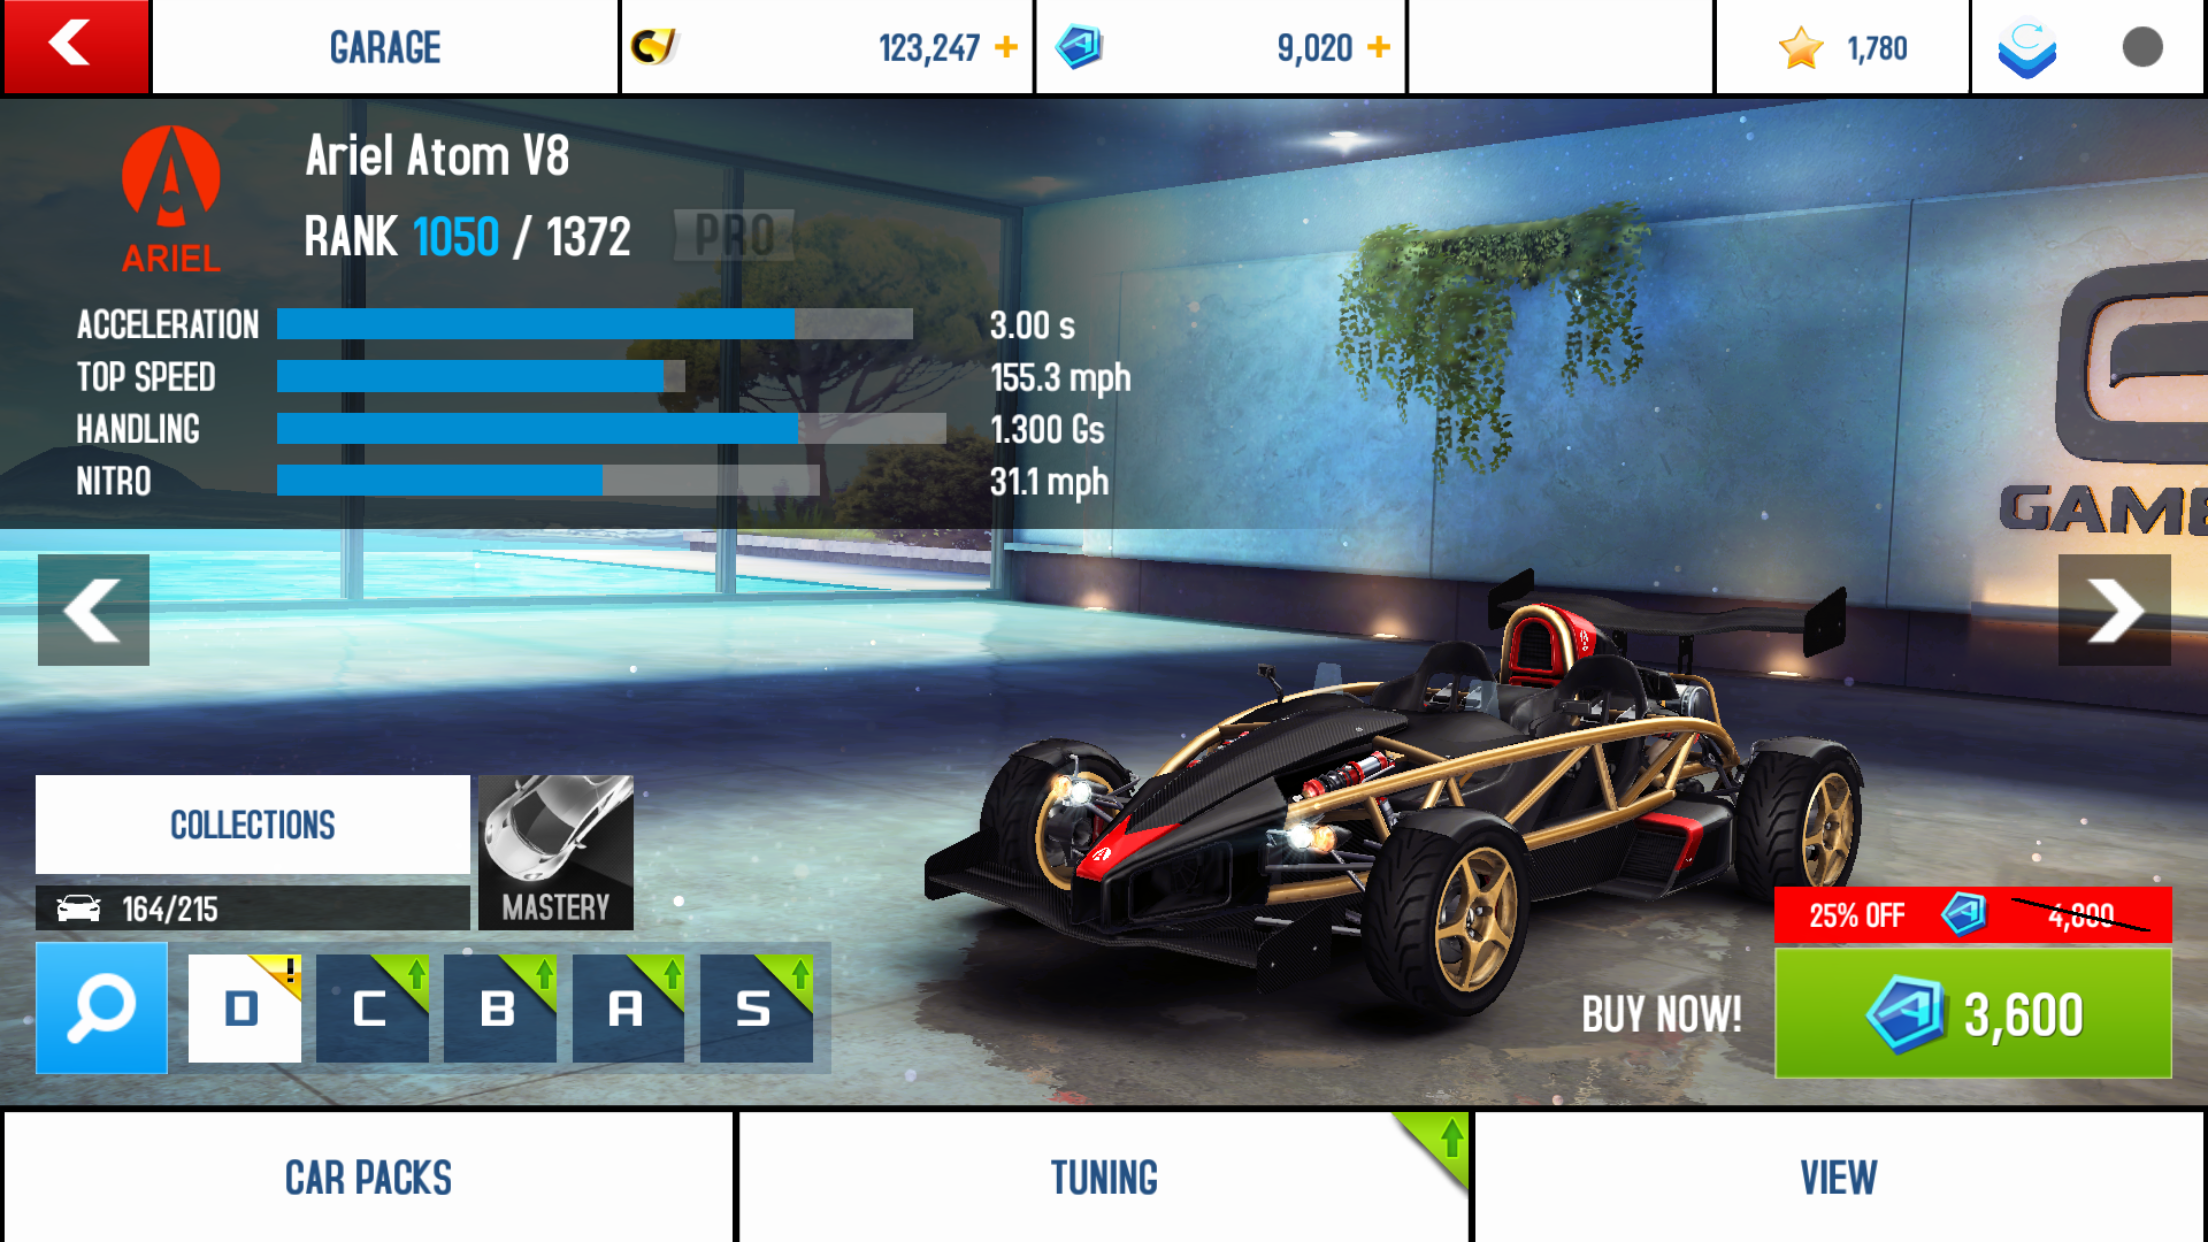 asfalt 8 multiplayer matchmaking Dejting Viagra